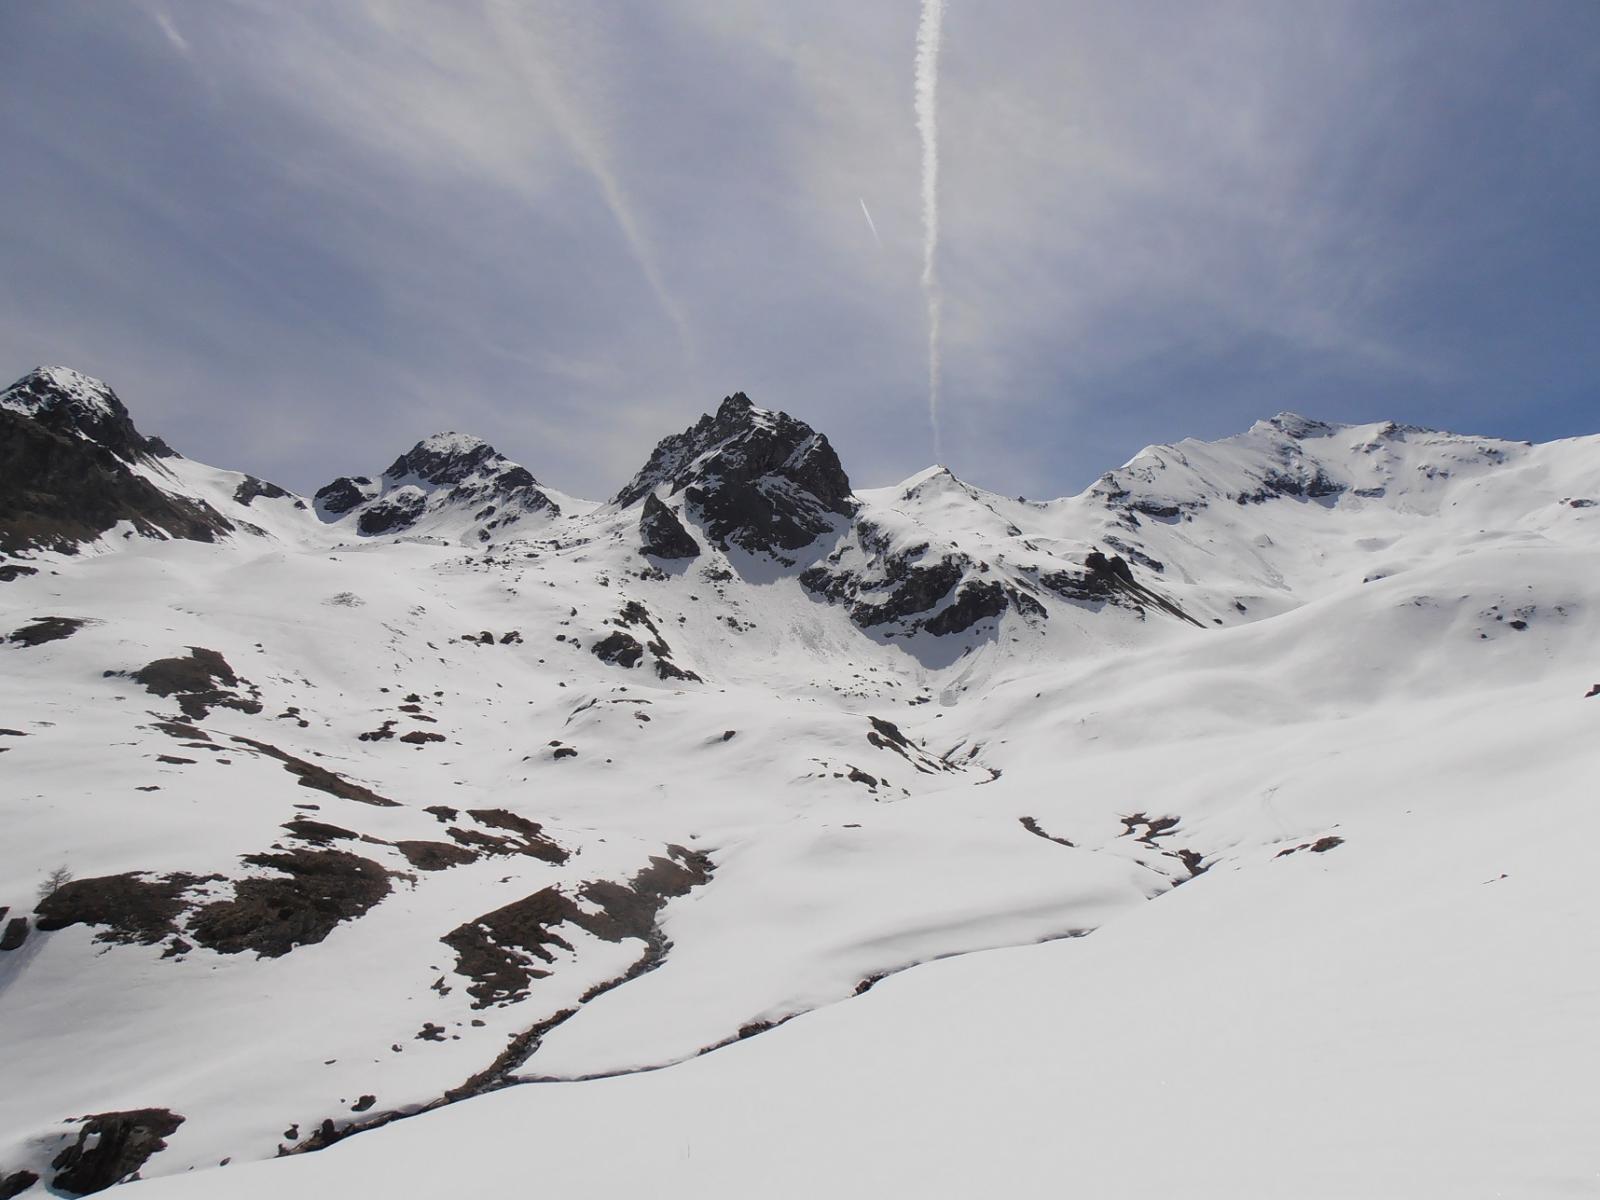 20 - Dal punto panoramico, Grand Avert, Piccolo Avert e Punta Tessonet